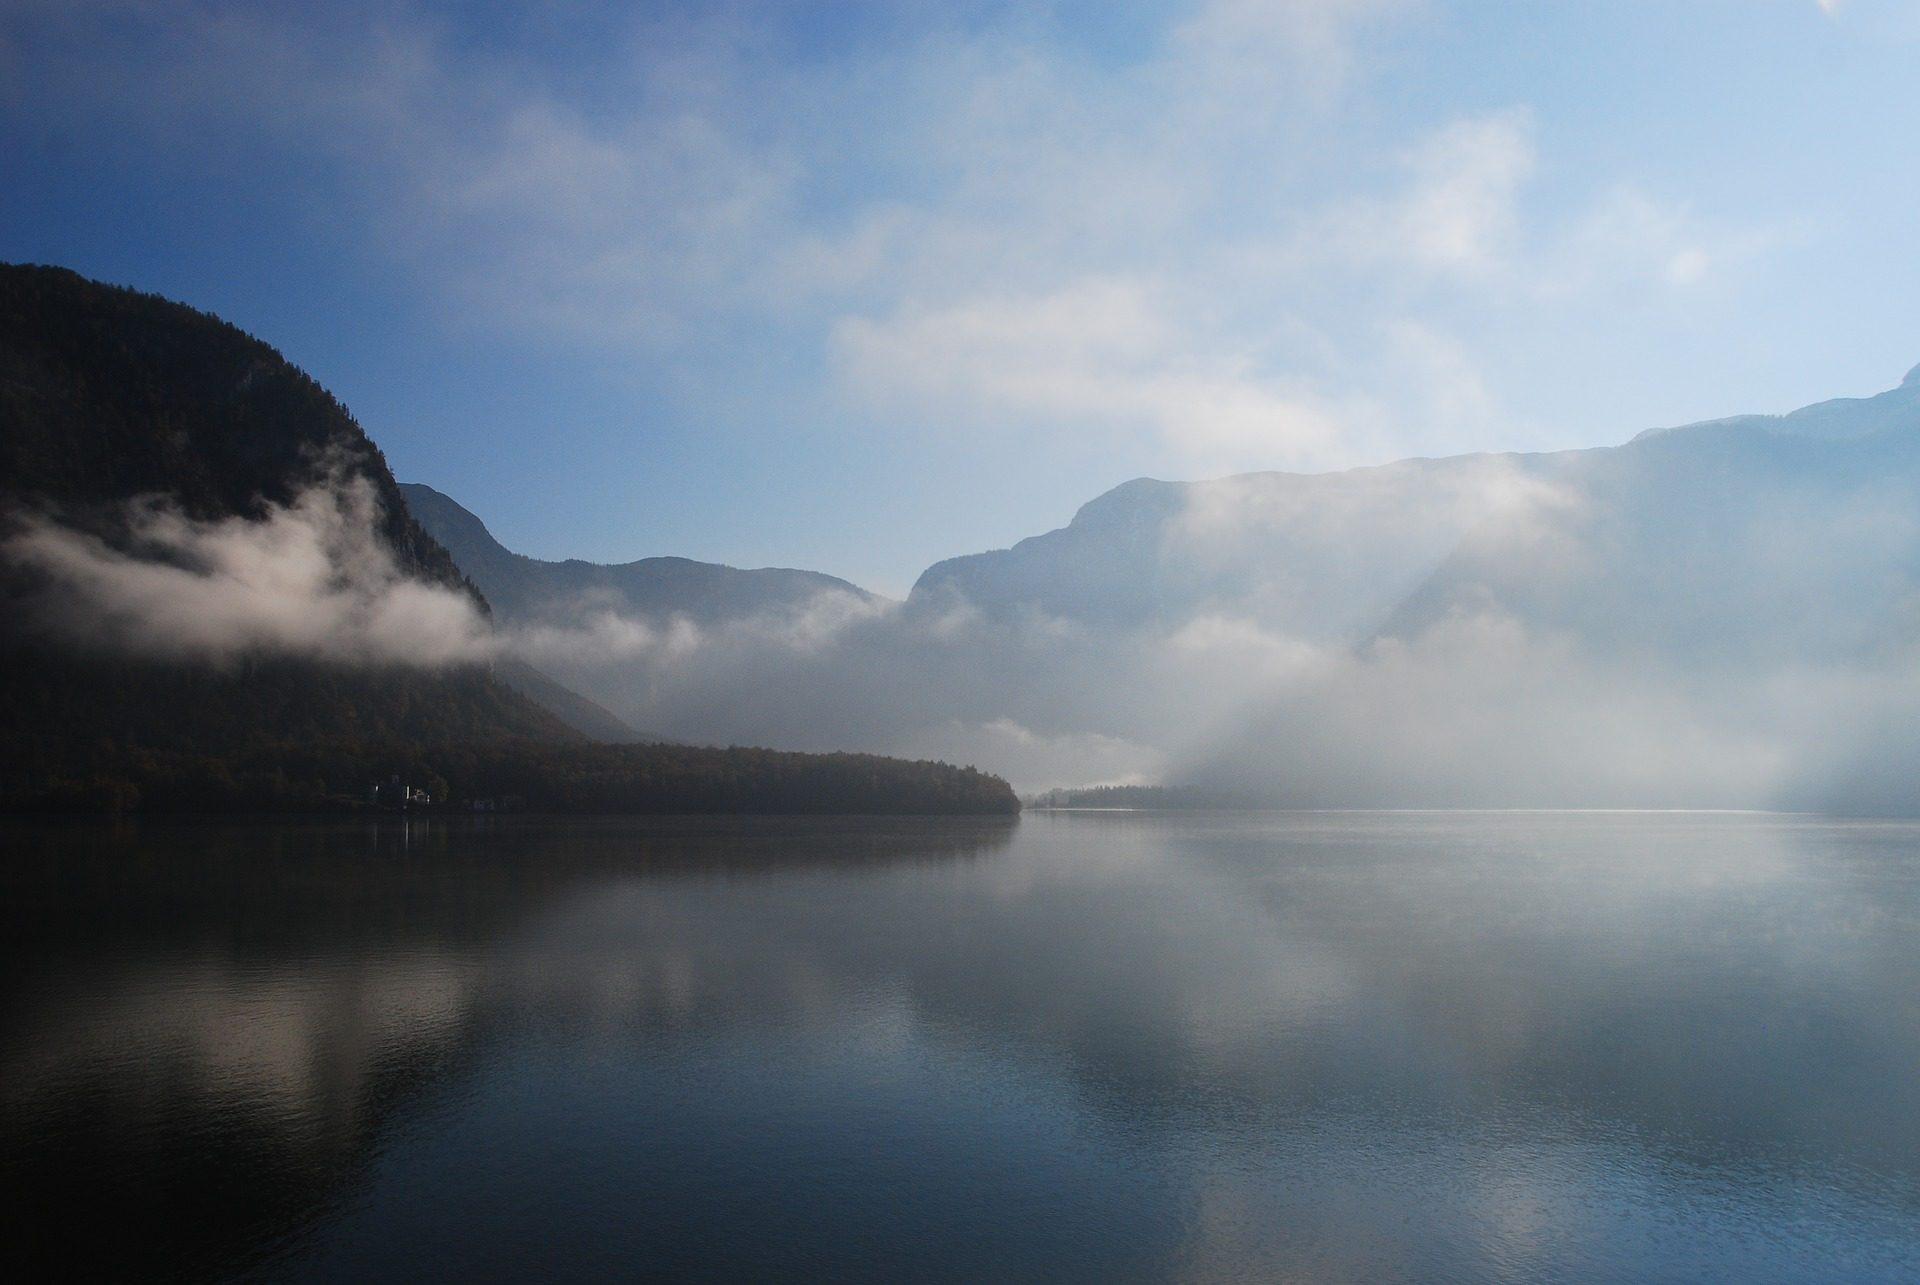 Озеро, Монтаньяс, облака, туман, Хальштеттер - Обои HD - Профессор falken.com